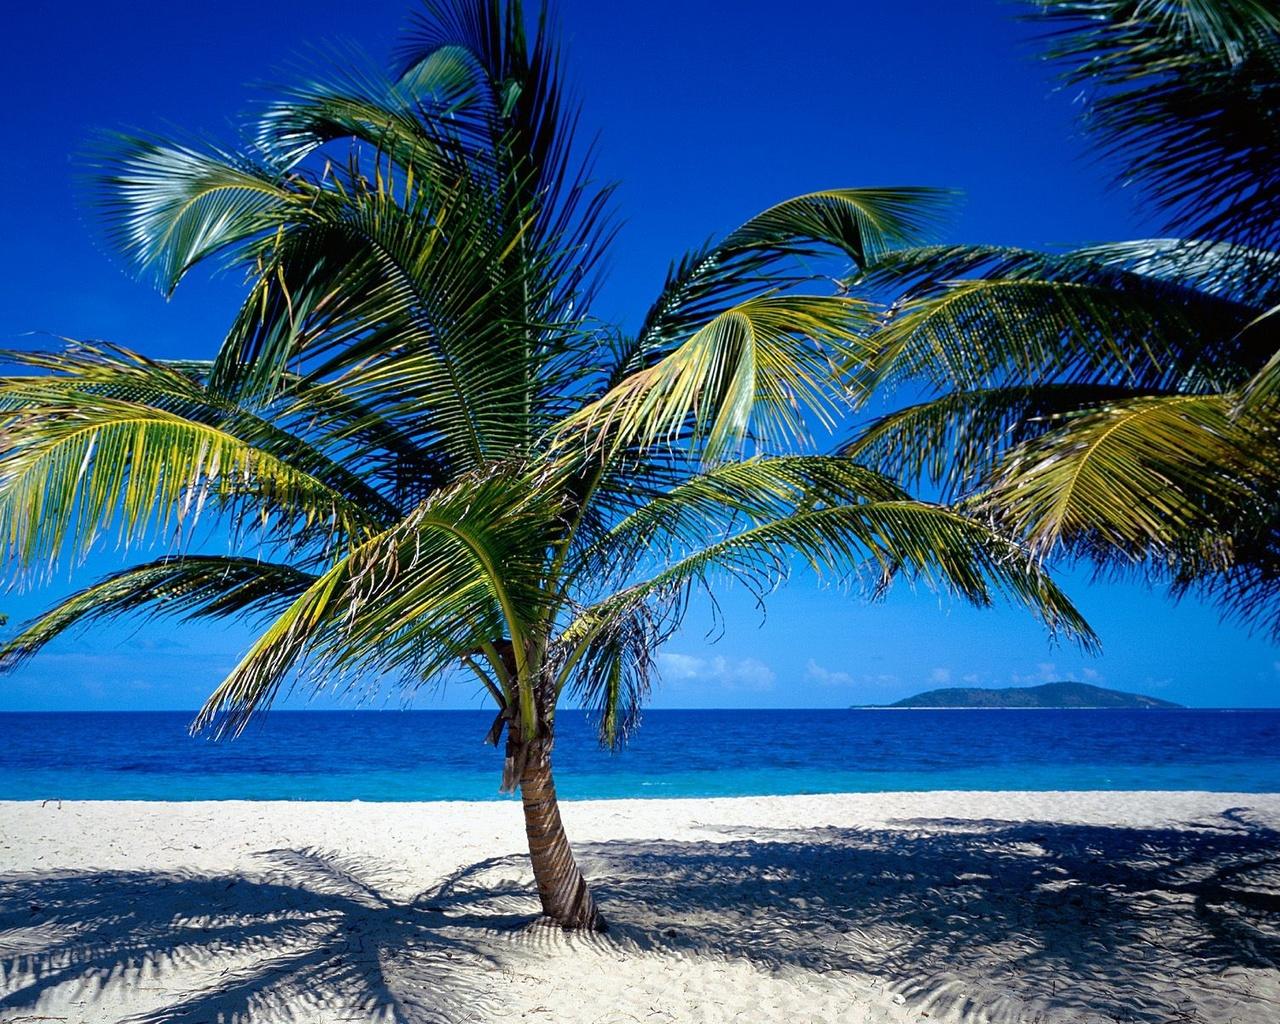 Travel Caribbean Beach Laptop Wallpaper Freetopwallpaper 1280x1024